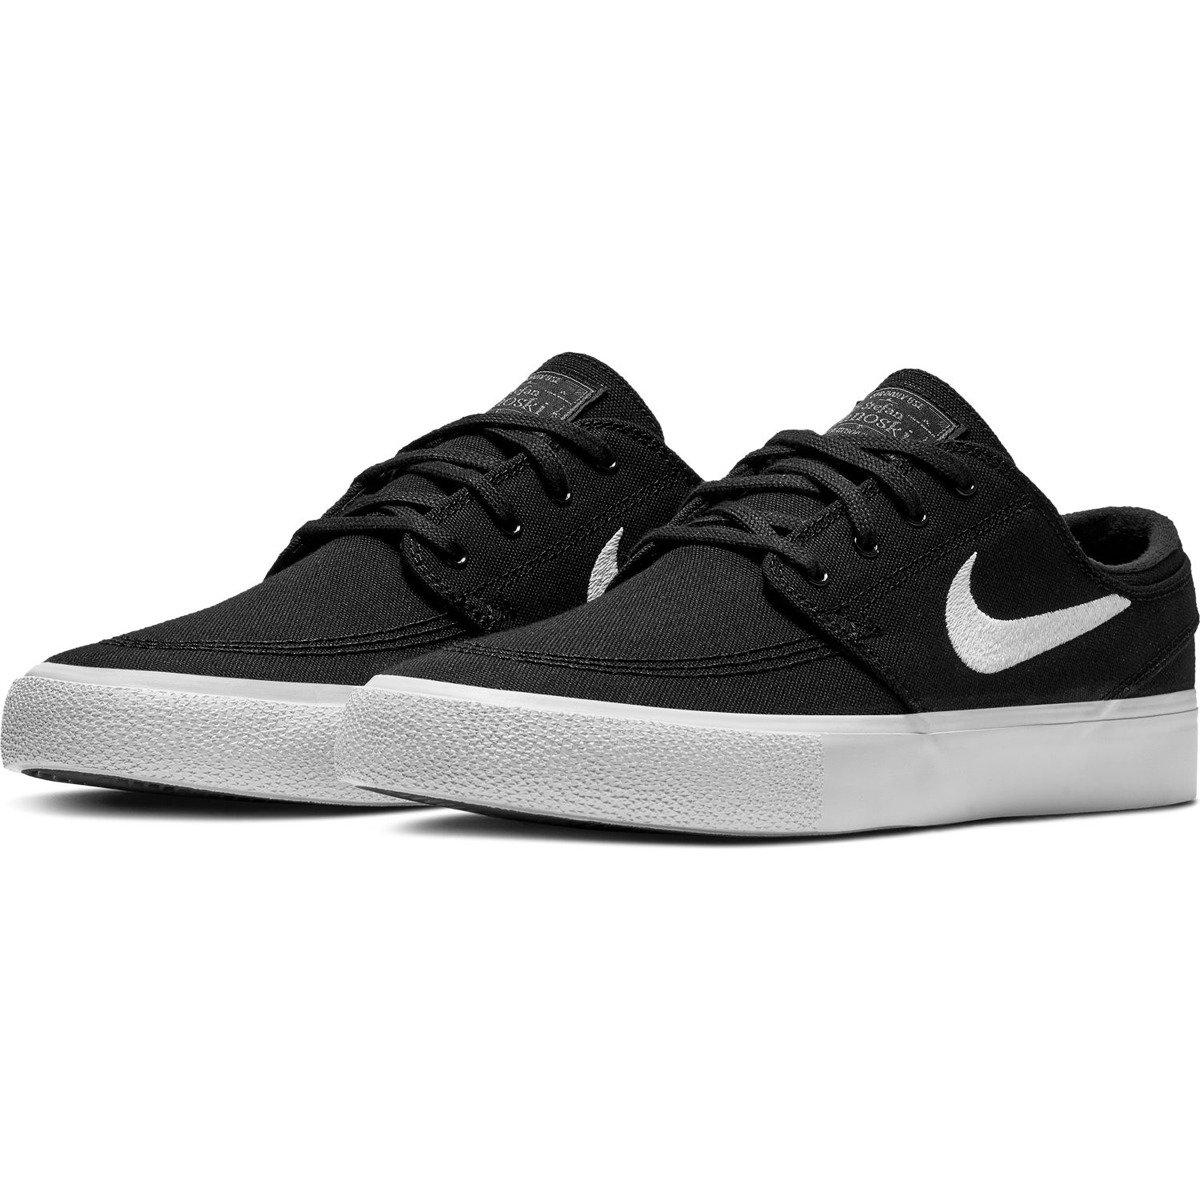 best sneakers b2514 4bd92 ... Nike Sb Janoski Canvas Premium Rm Parachute Beige black-ale Brown-white  Click to zoom ...